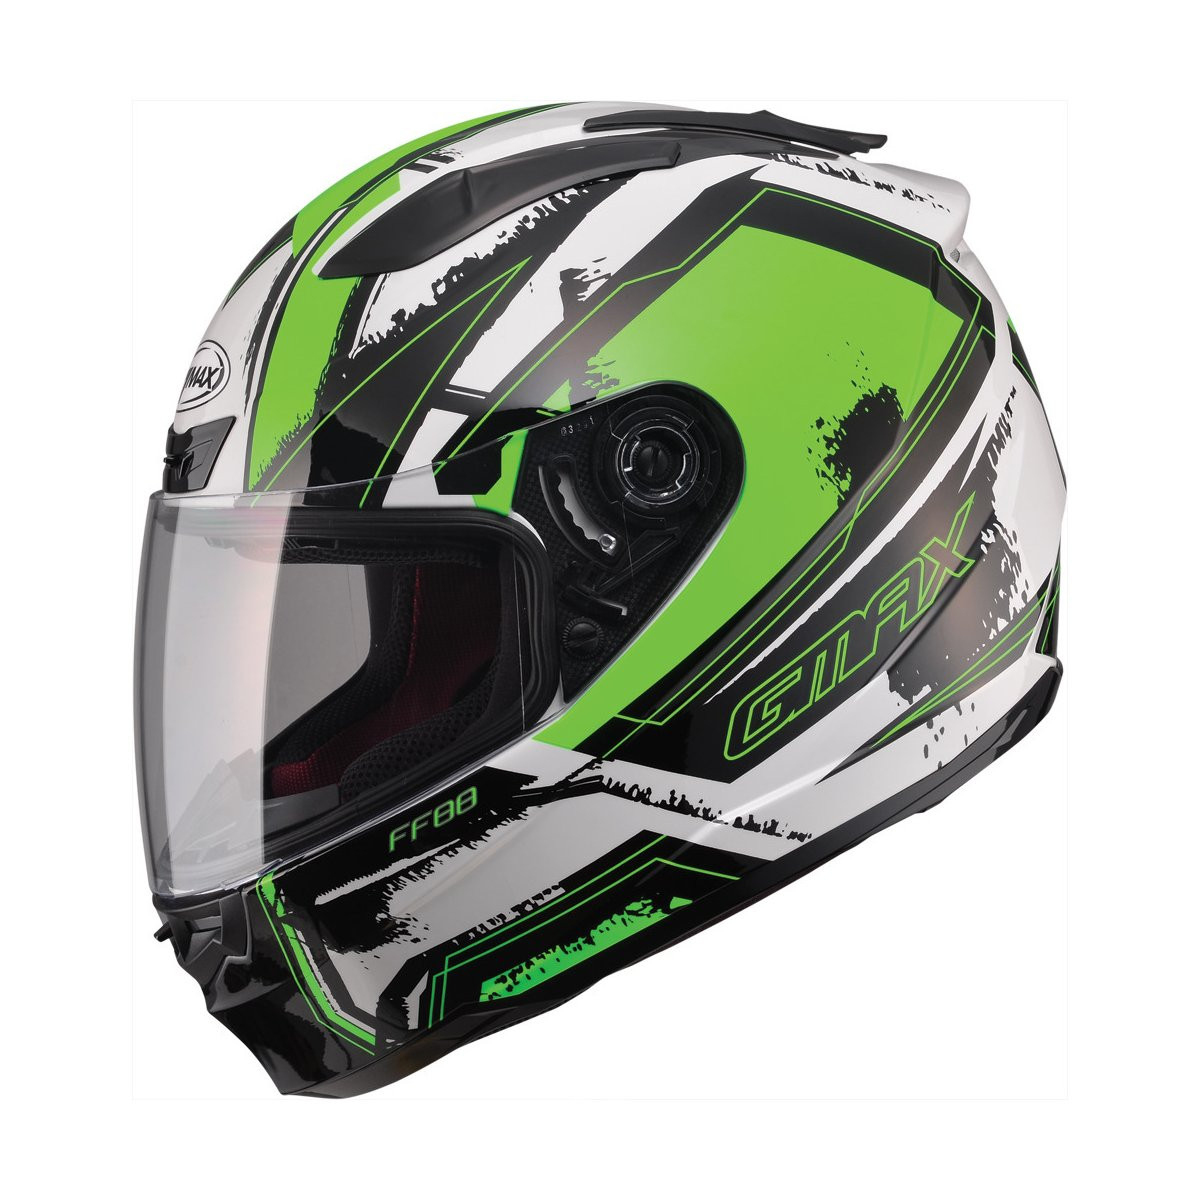 a9c5b5f0 G-Max - FF88 X-Star Helmet - Motorcycle House